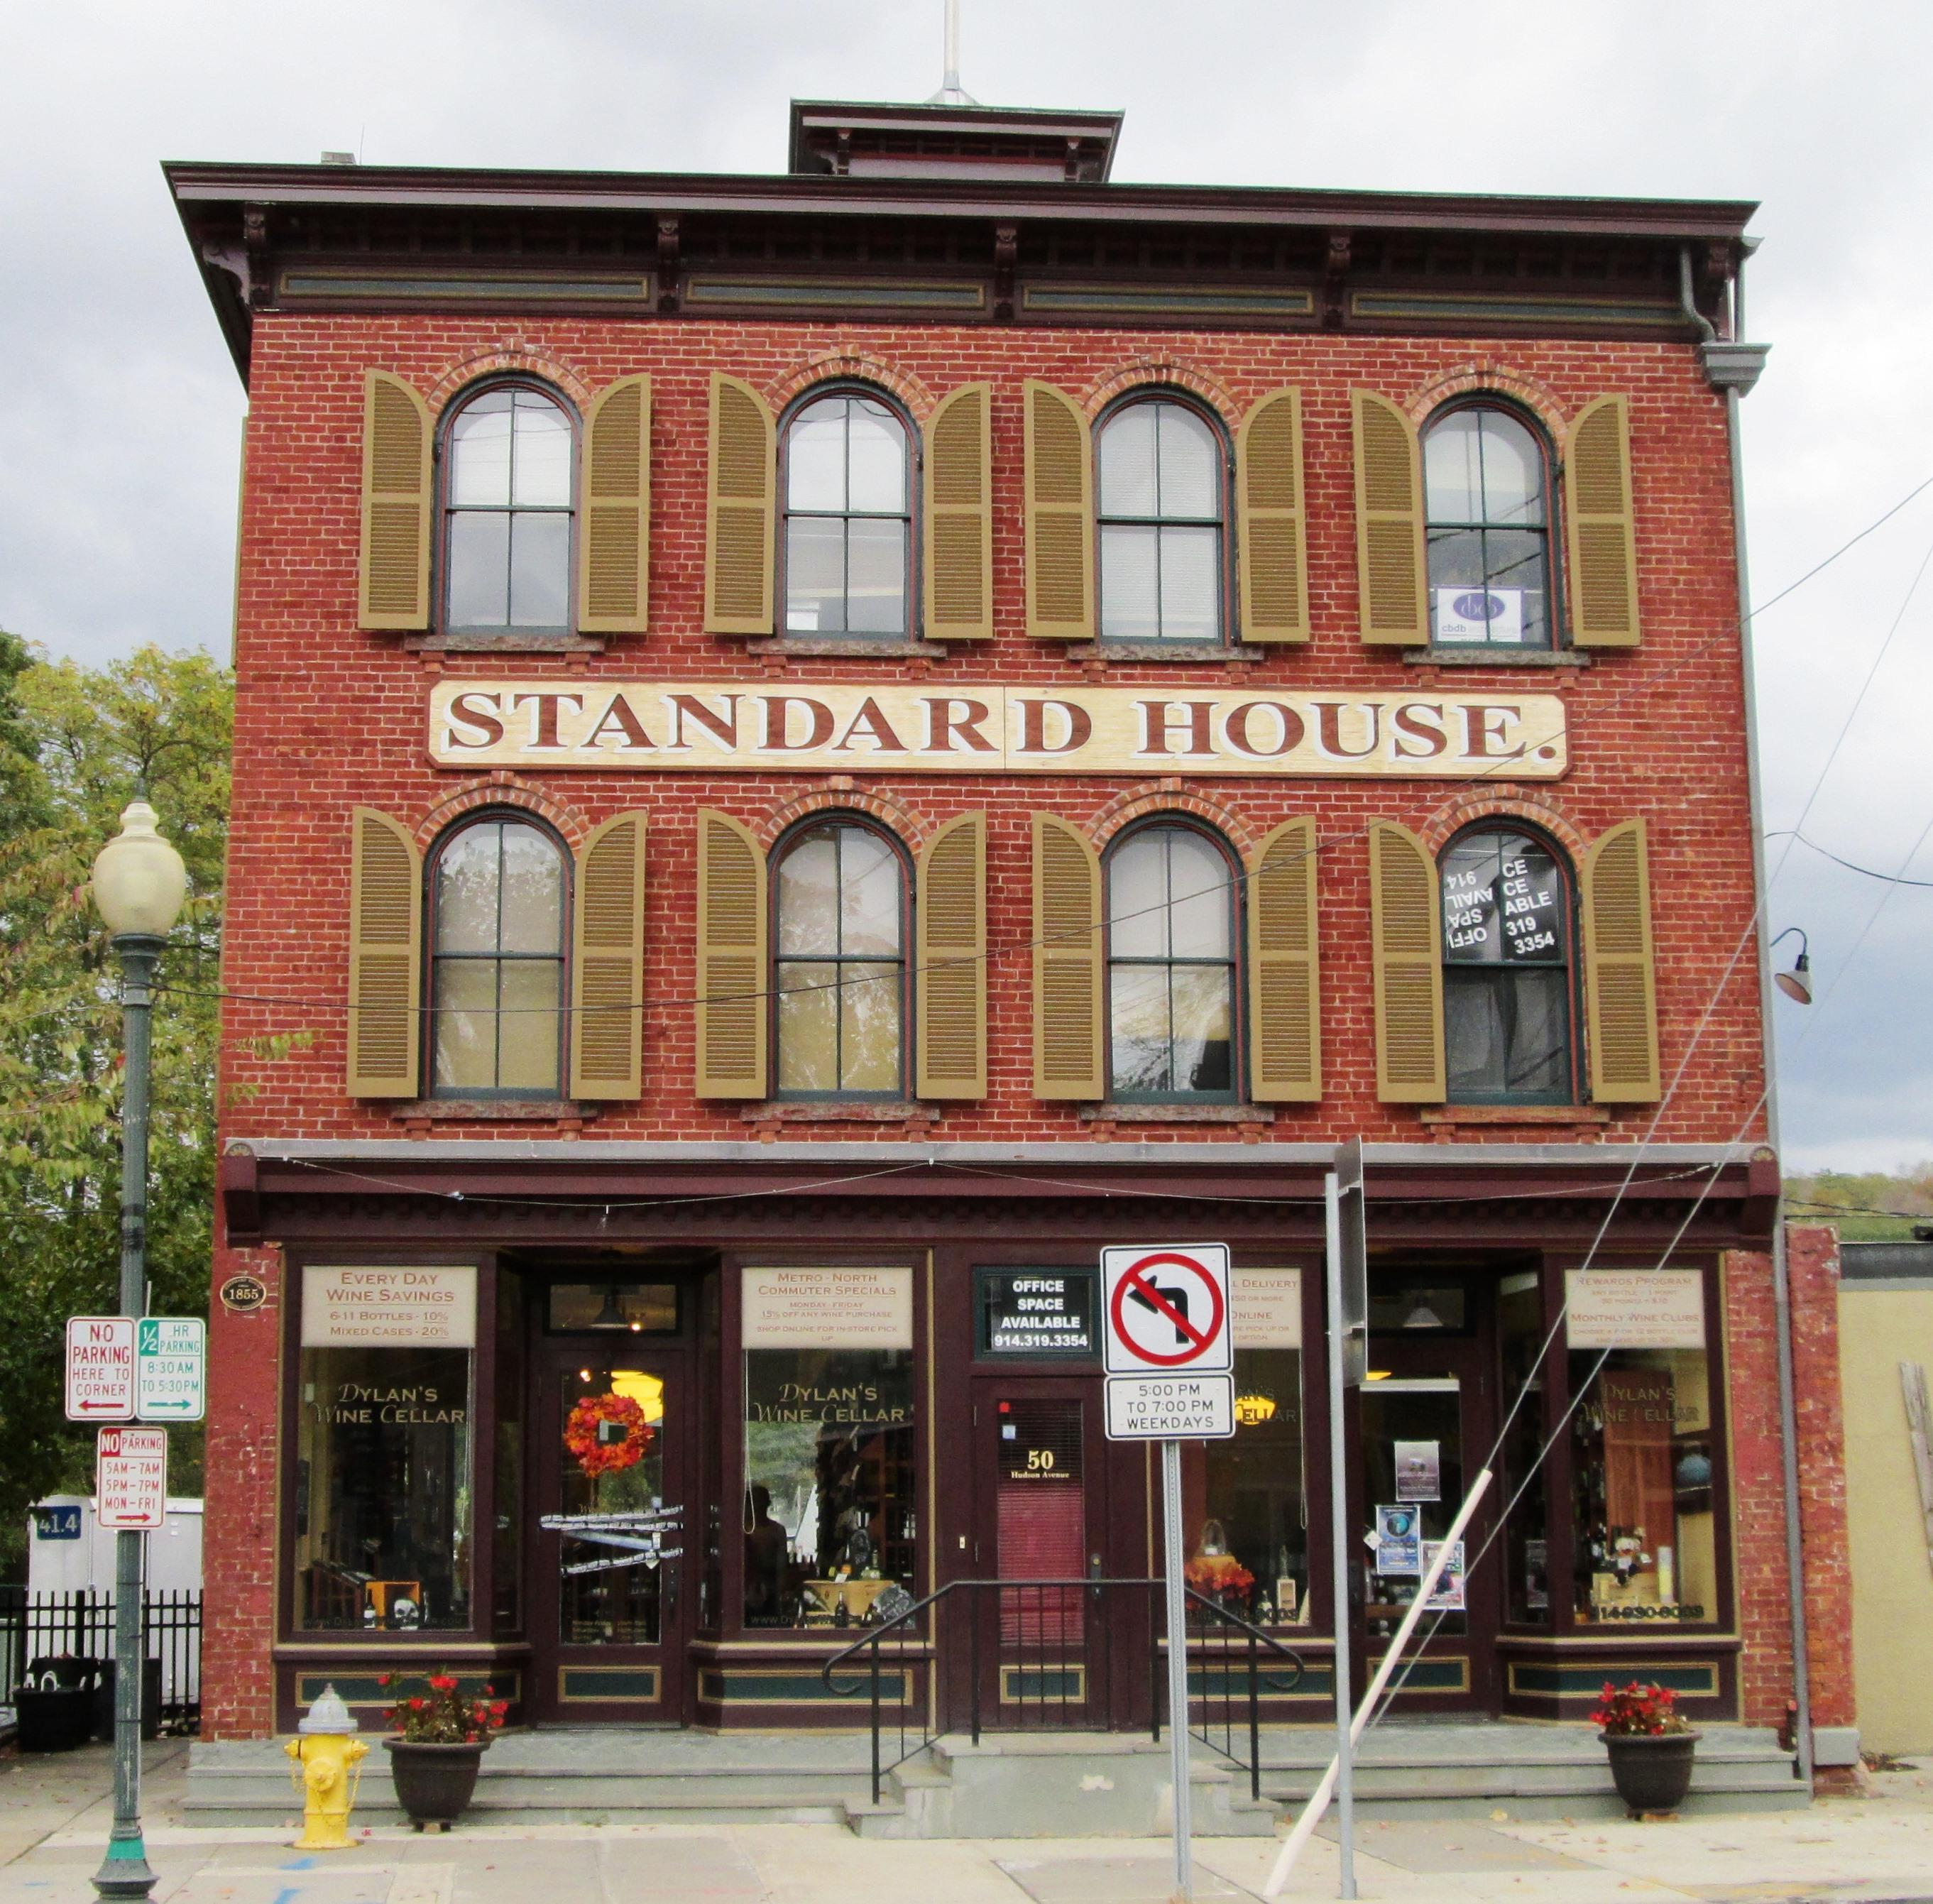 Standard House Exterior